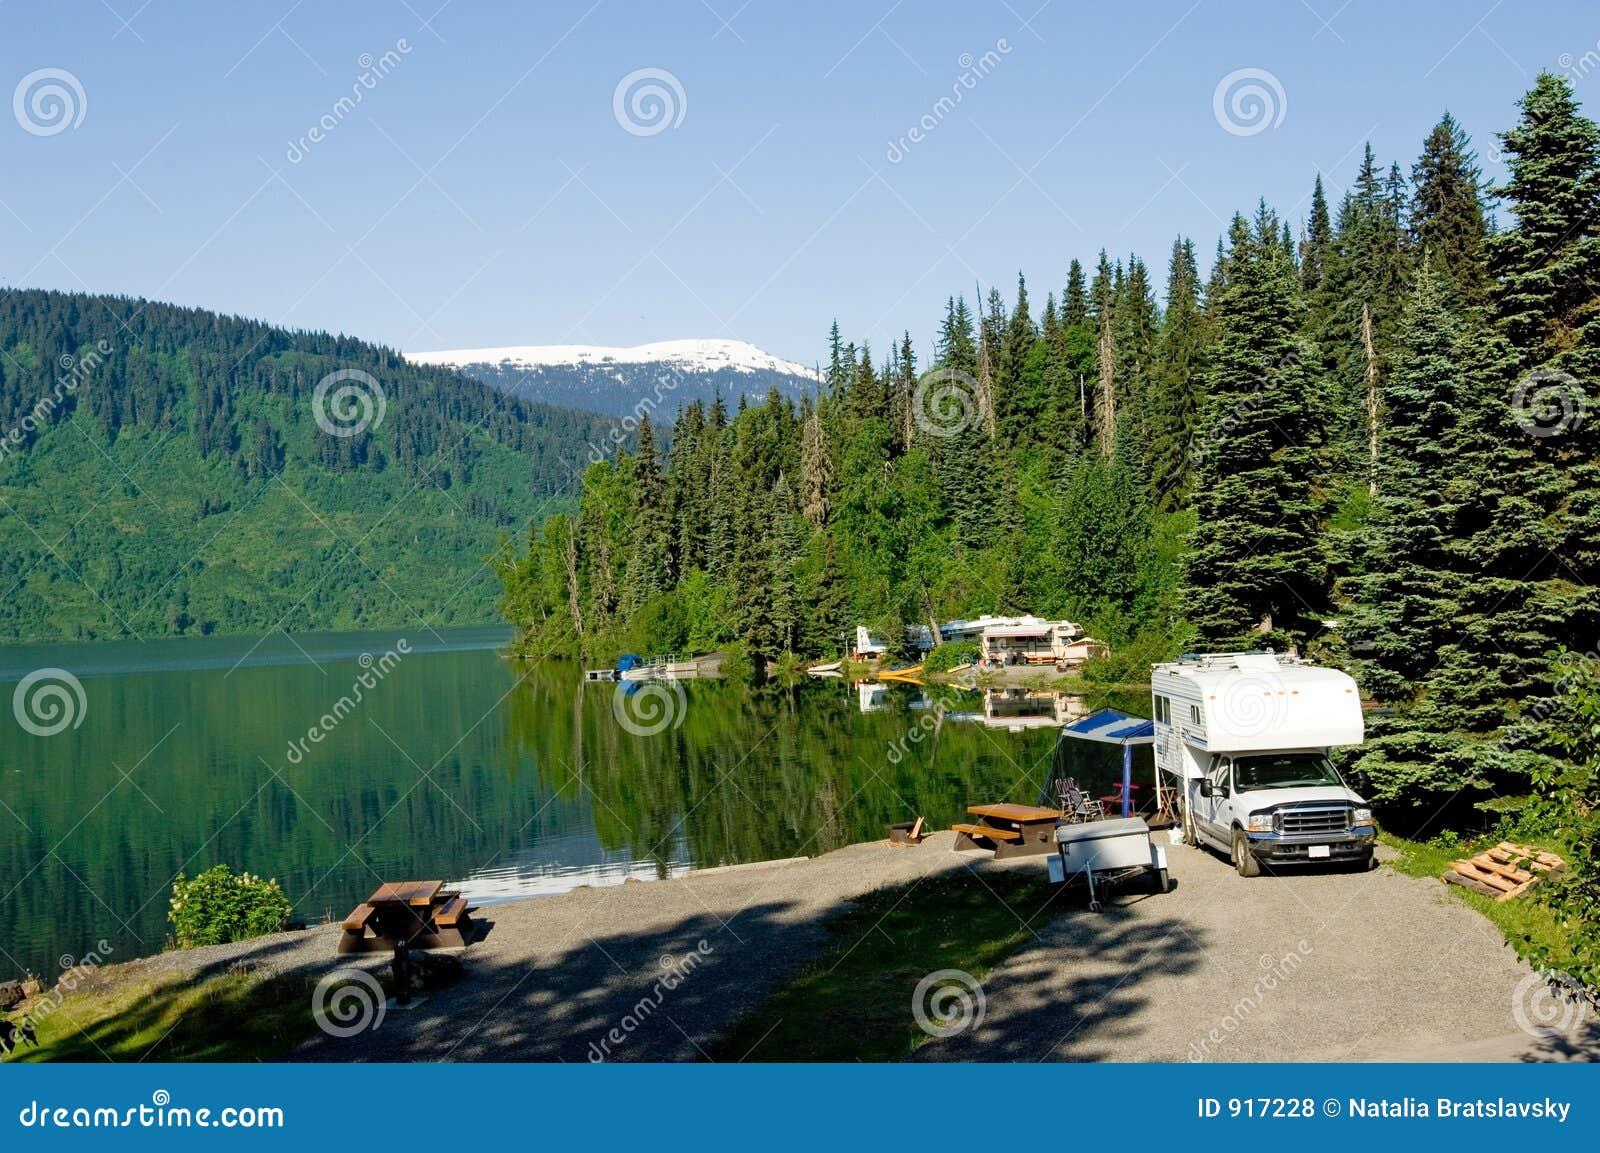 RV park at the lake stock photo. Image of america, swim ...